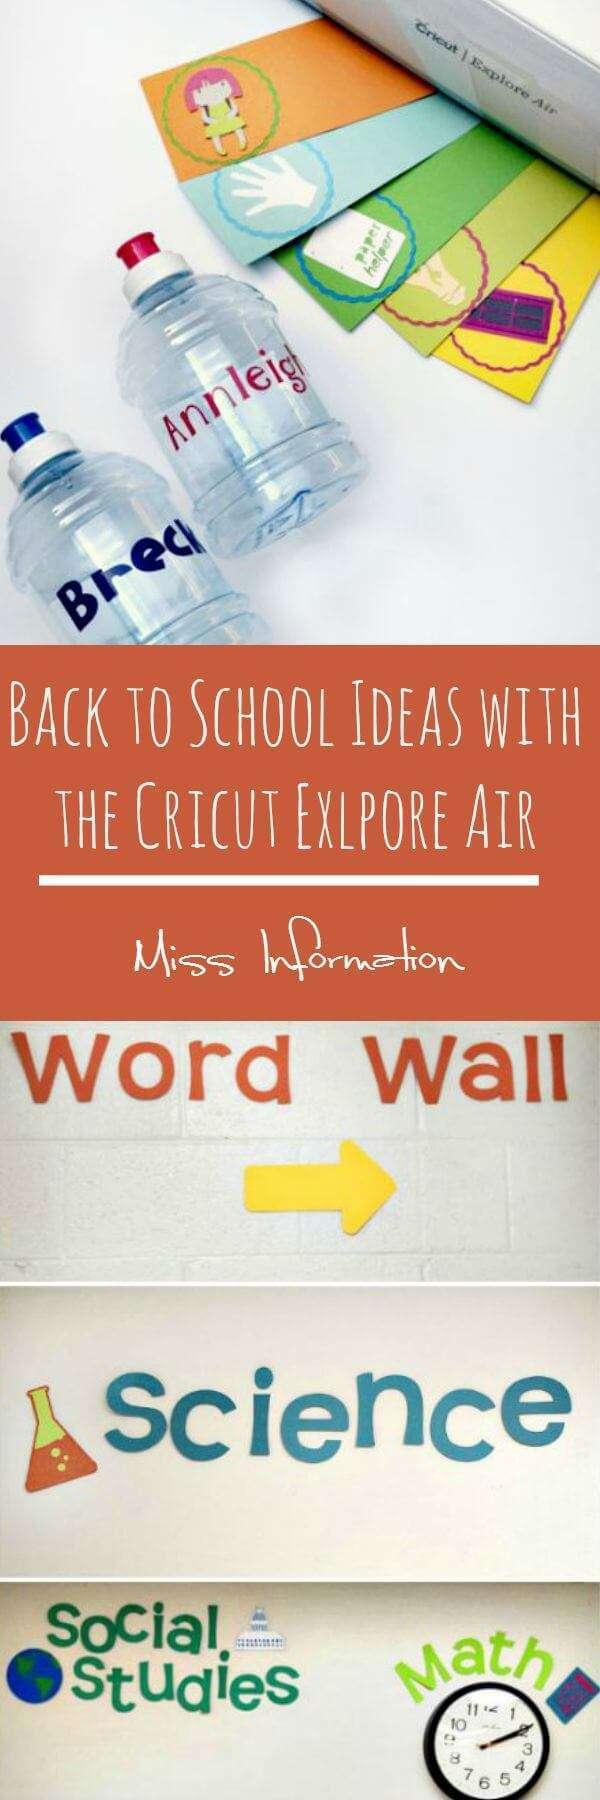 Cricut Explore Air - Back to School Ideas | Miss Information